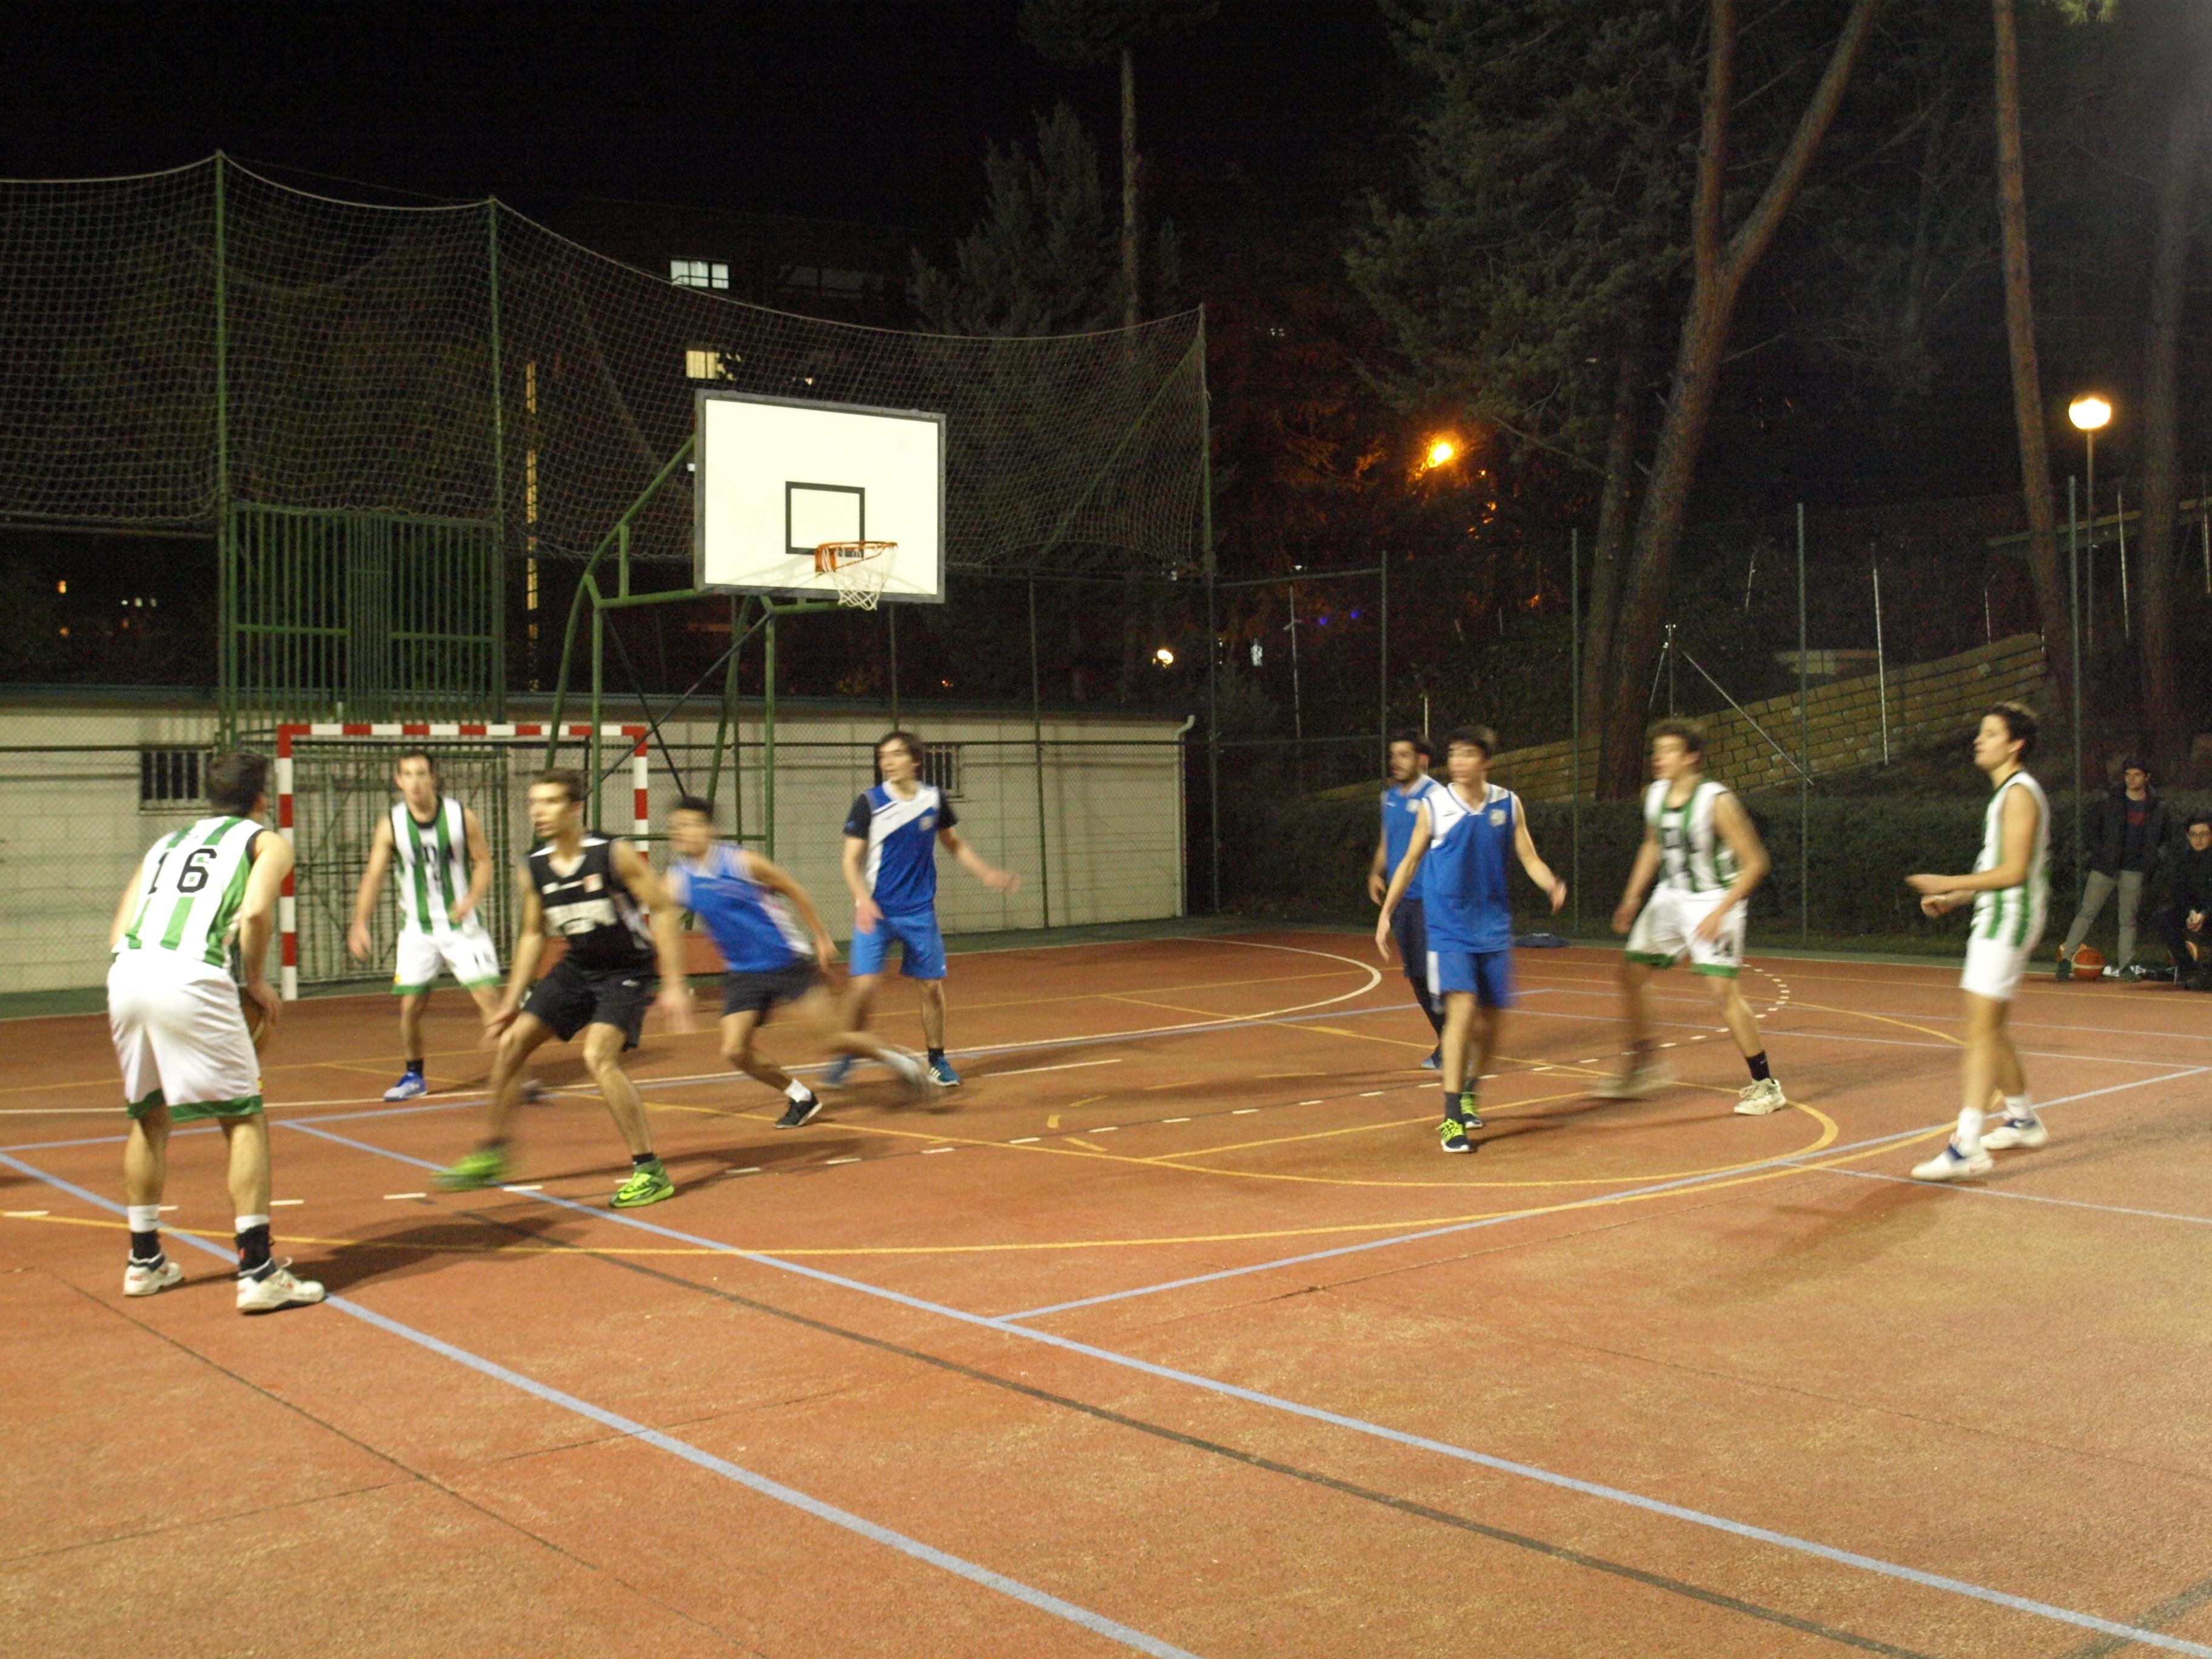 Cuartos de Final de Baloncesto